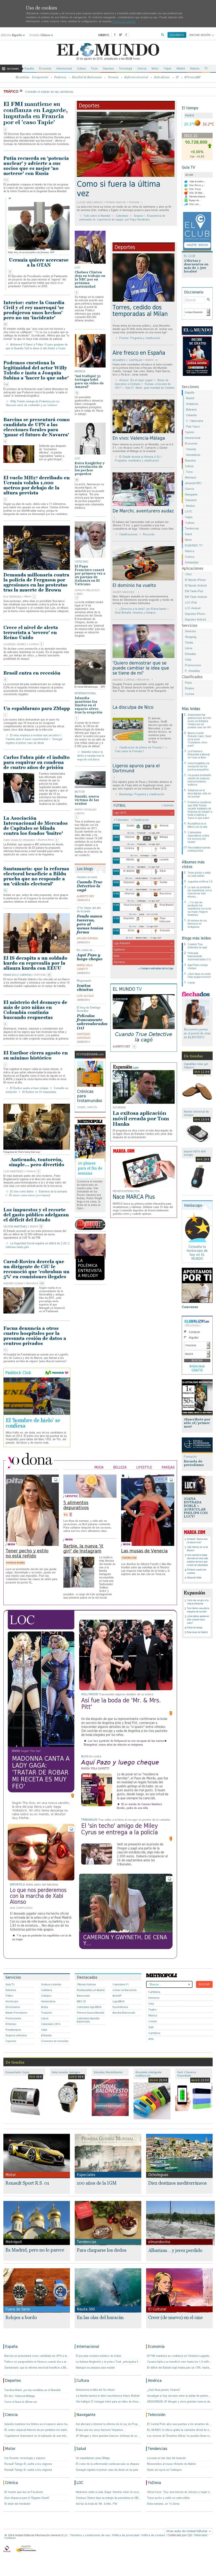 El Mundo at Friday Aug. 29, 2014, 10:10 p.m. UTC